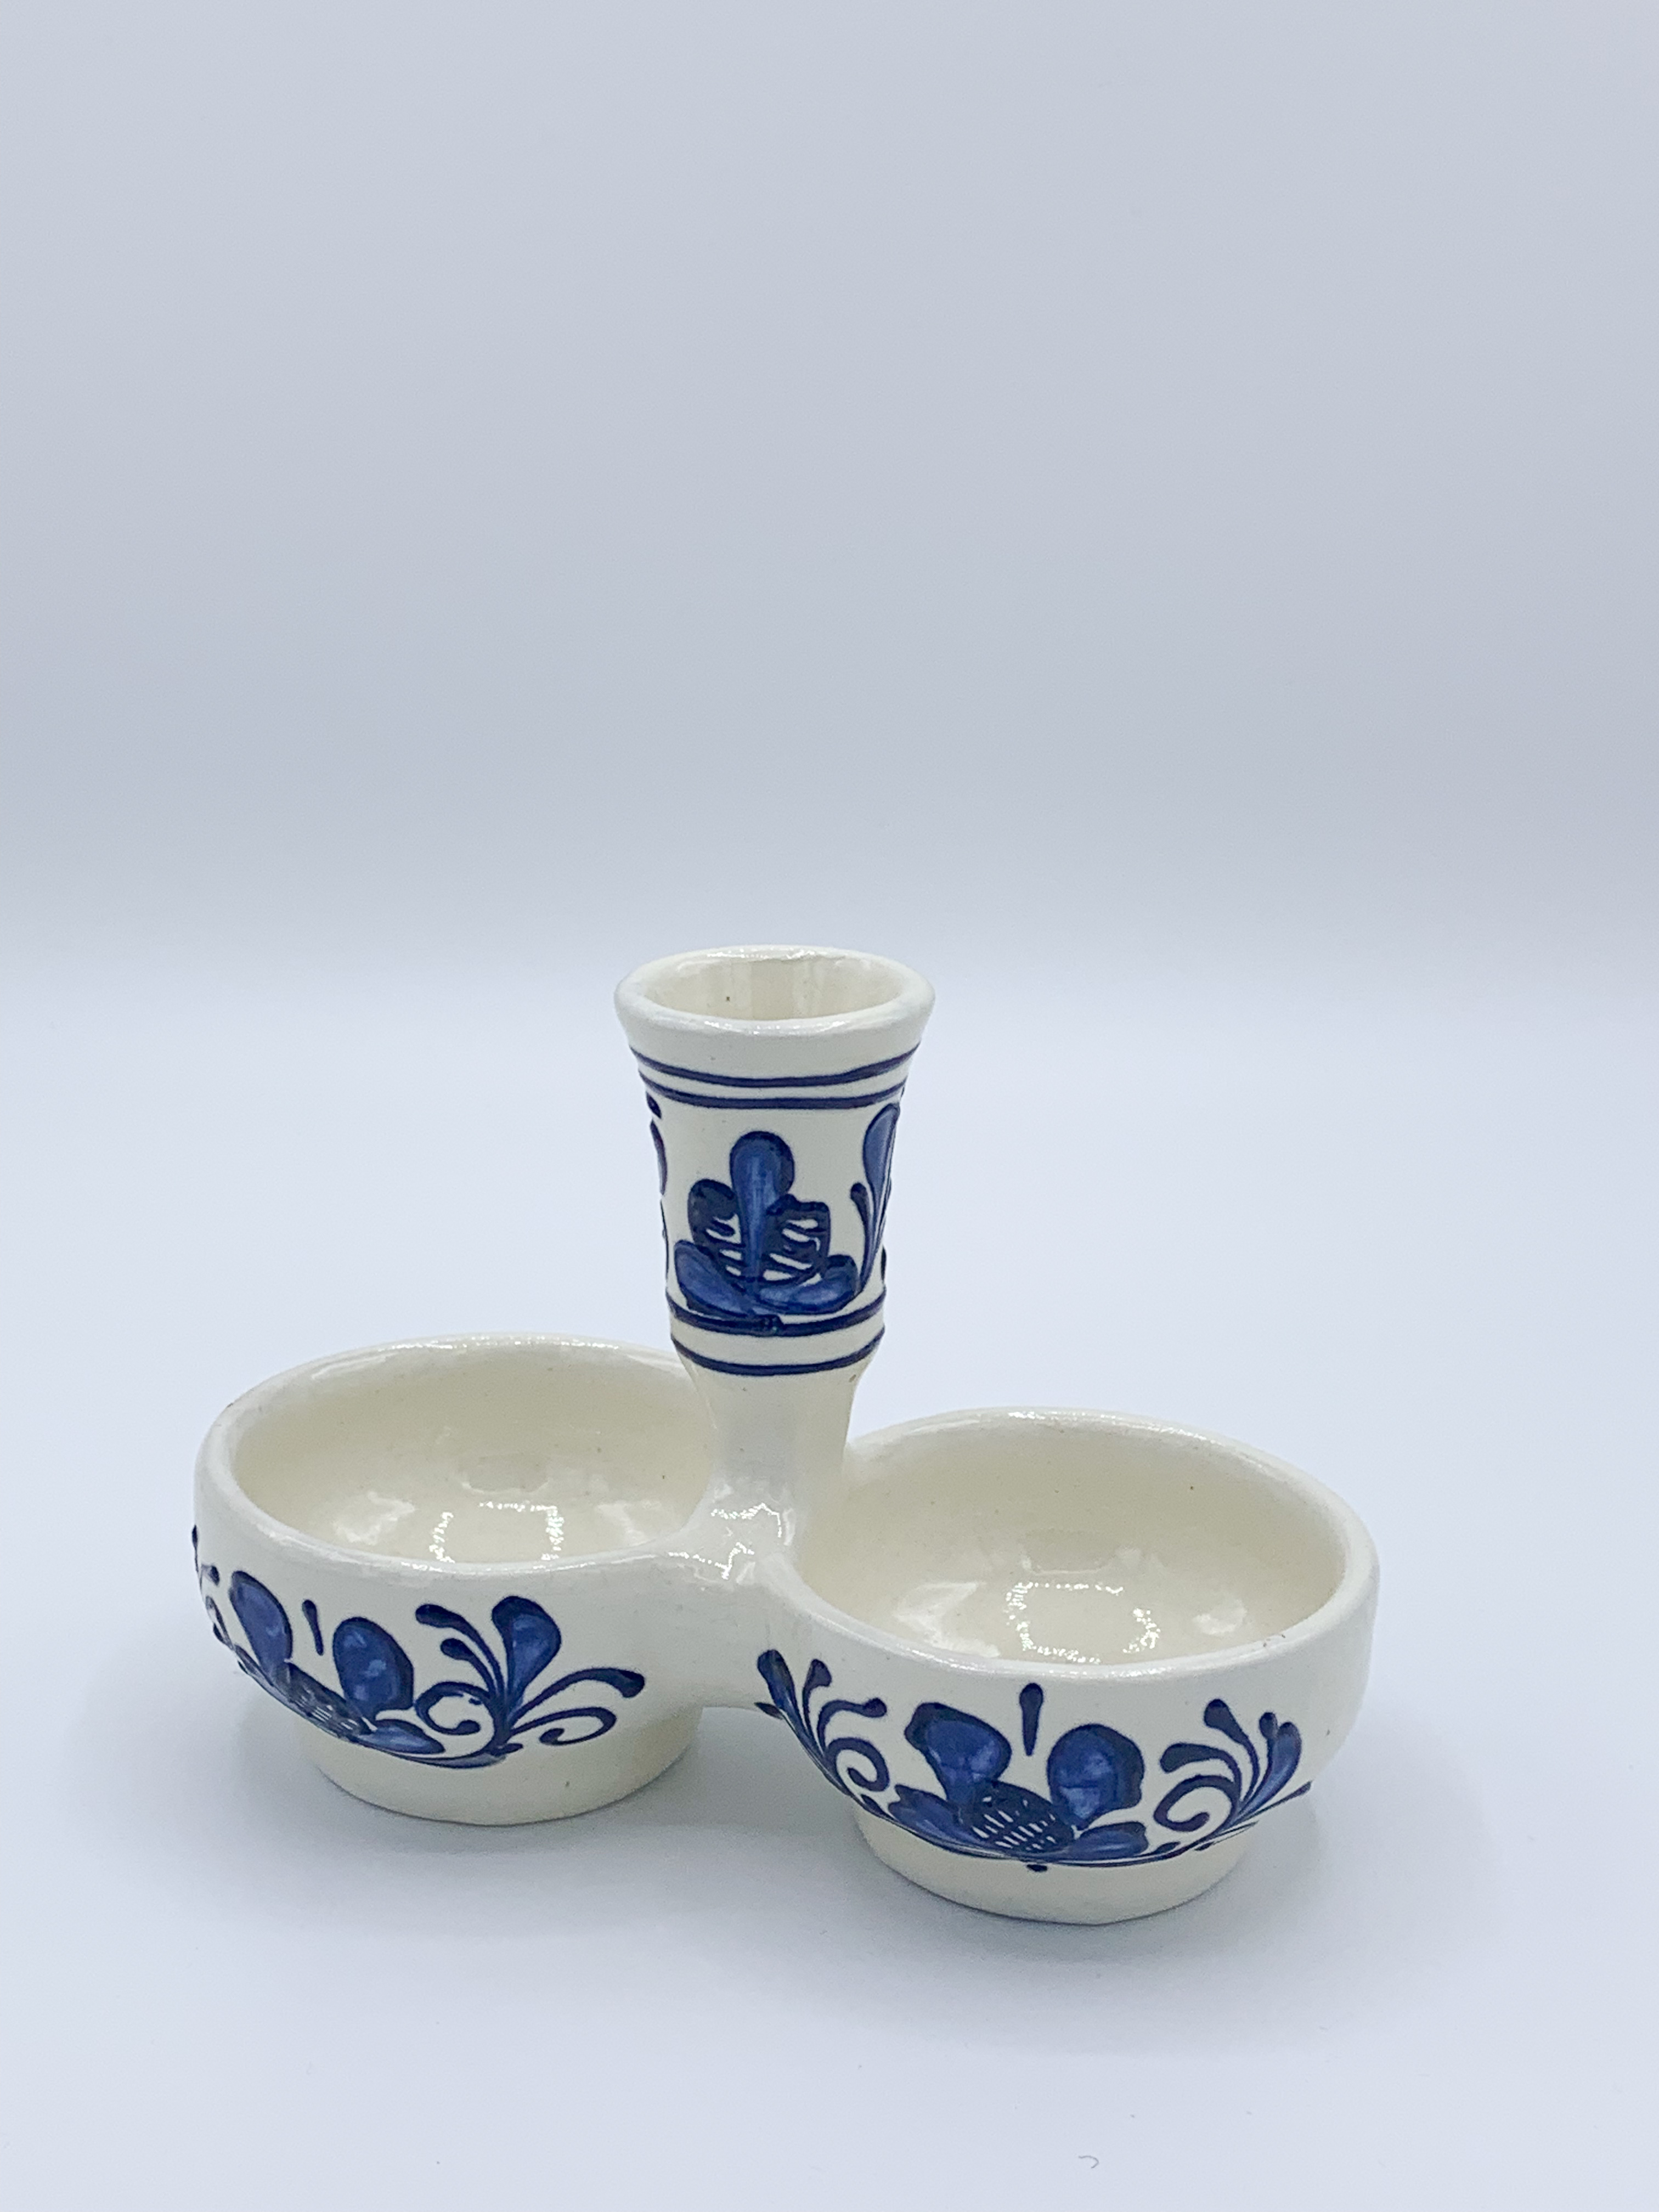 Solnita din ceramica de corund [0]